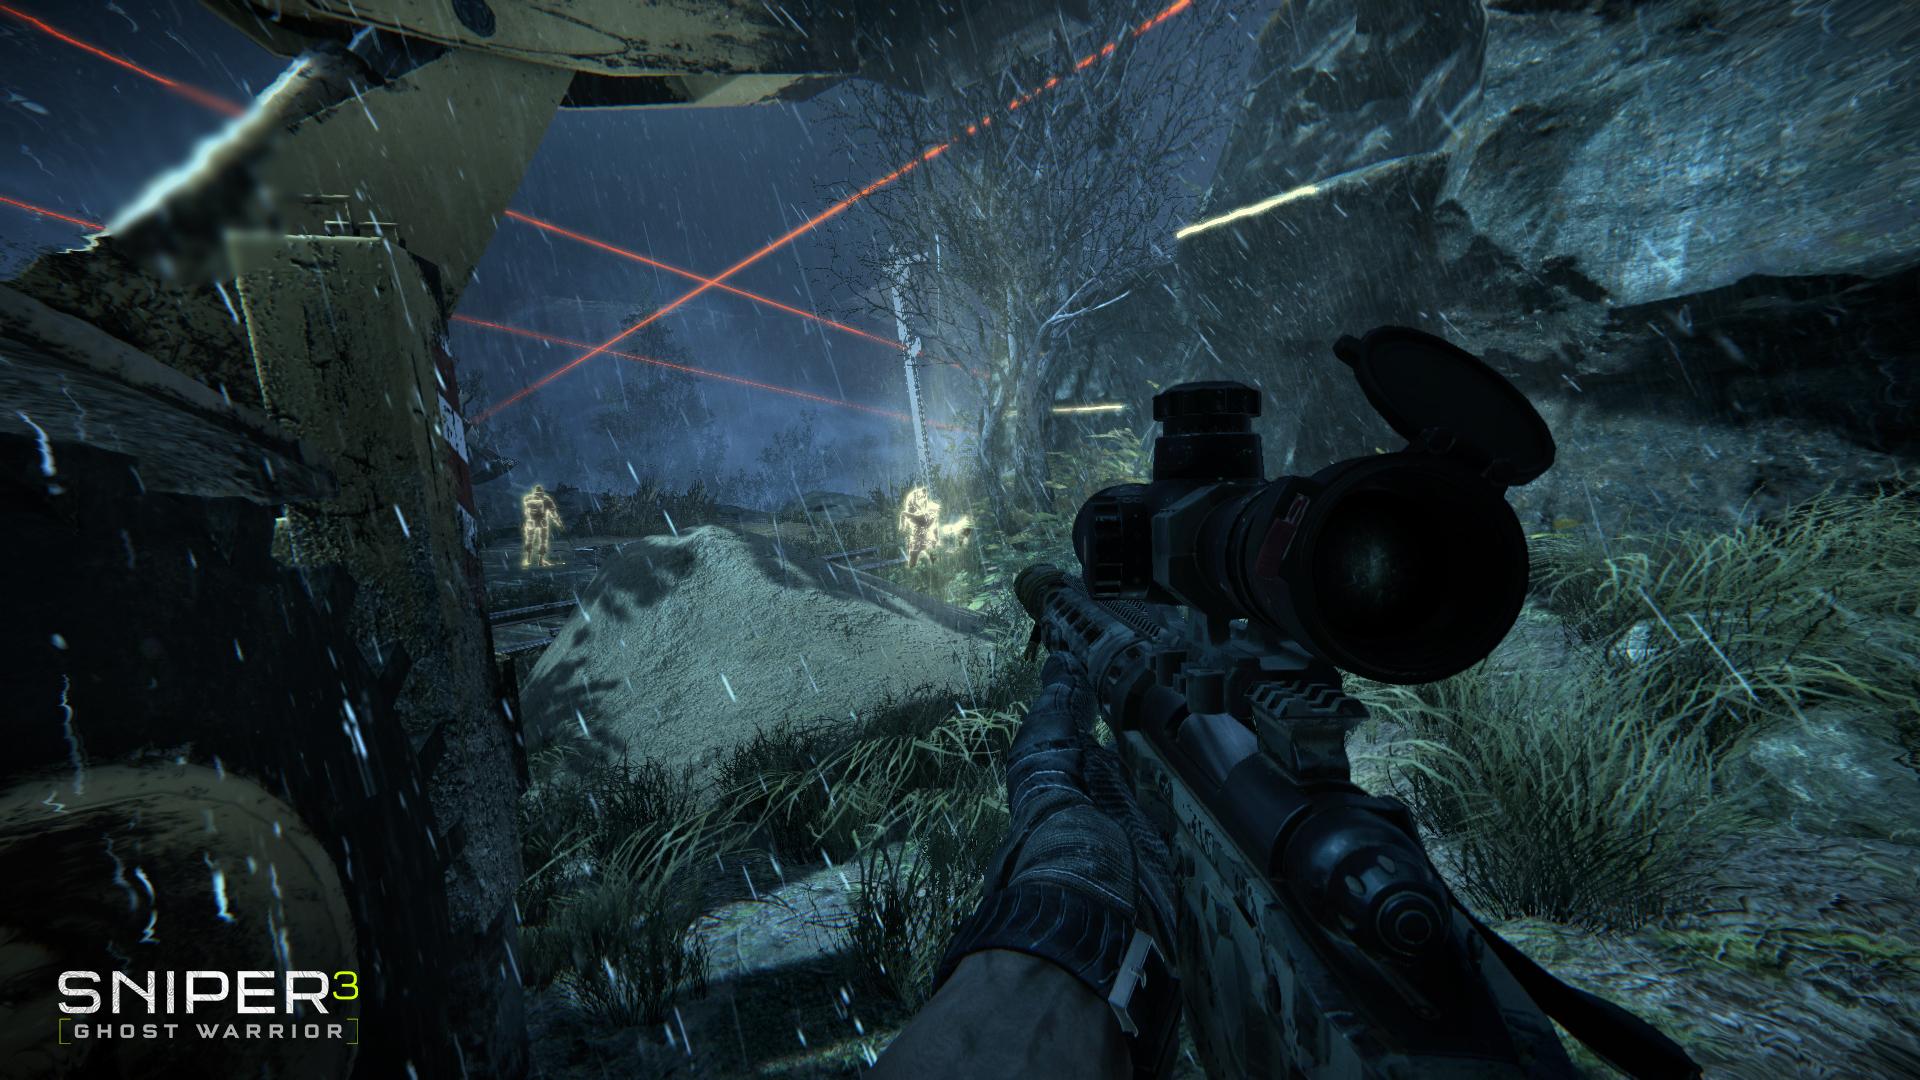 Sniper Ghost Warrior 3 Wallpaper